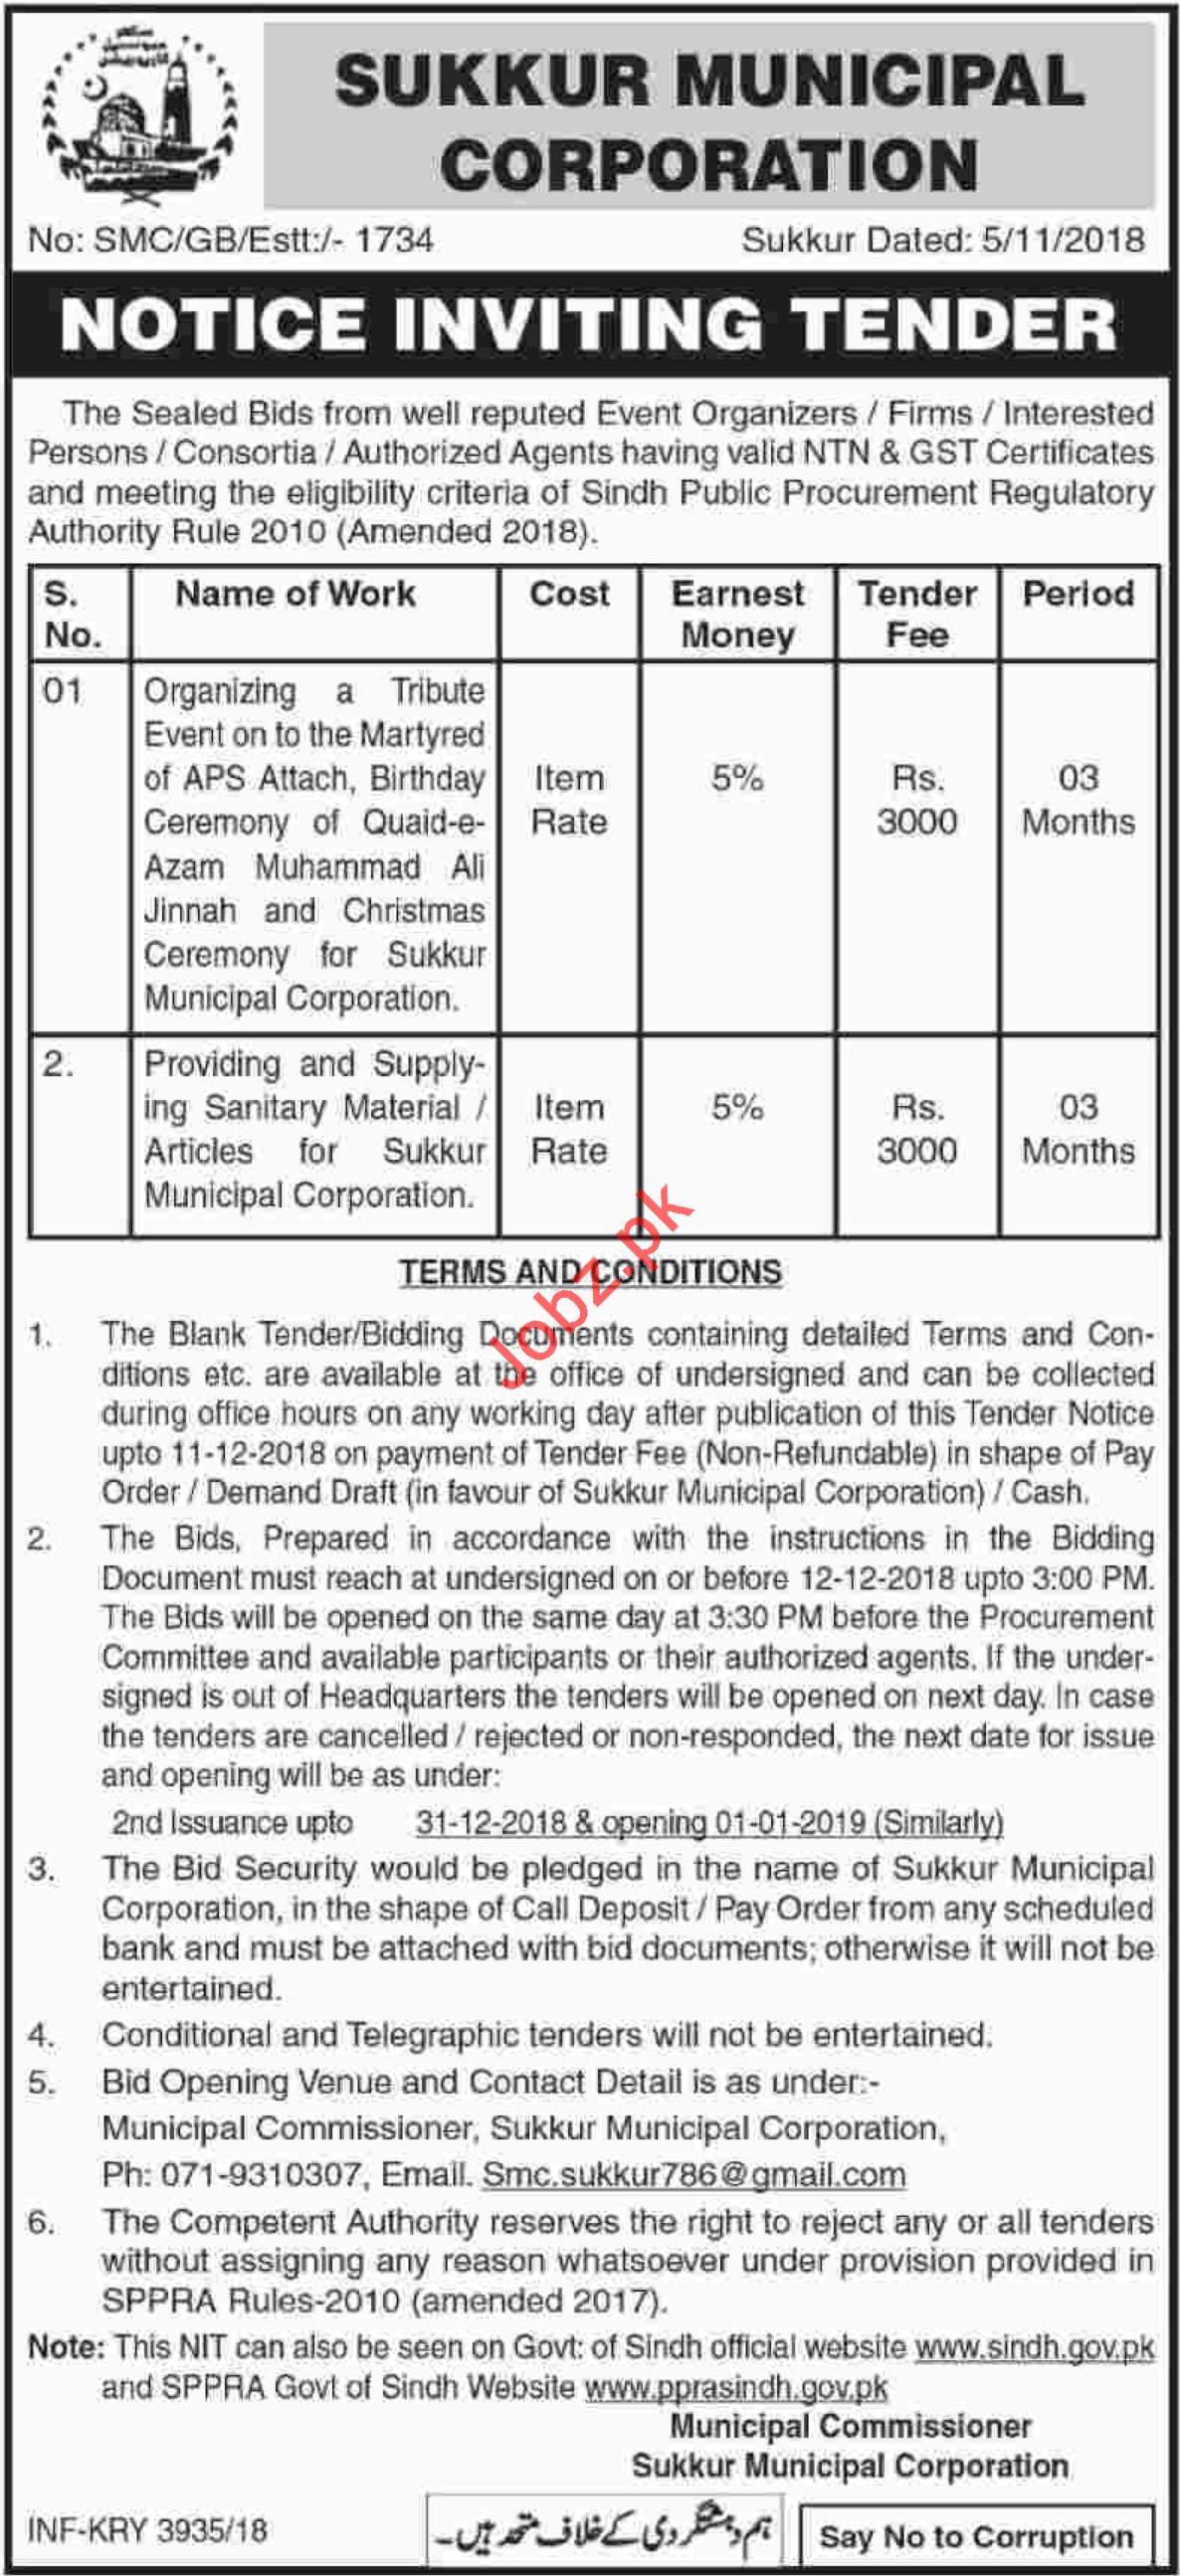 Sukkur Municipal Corporation Notice Inviting Tender 2019 Government